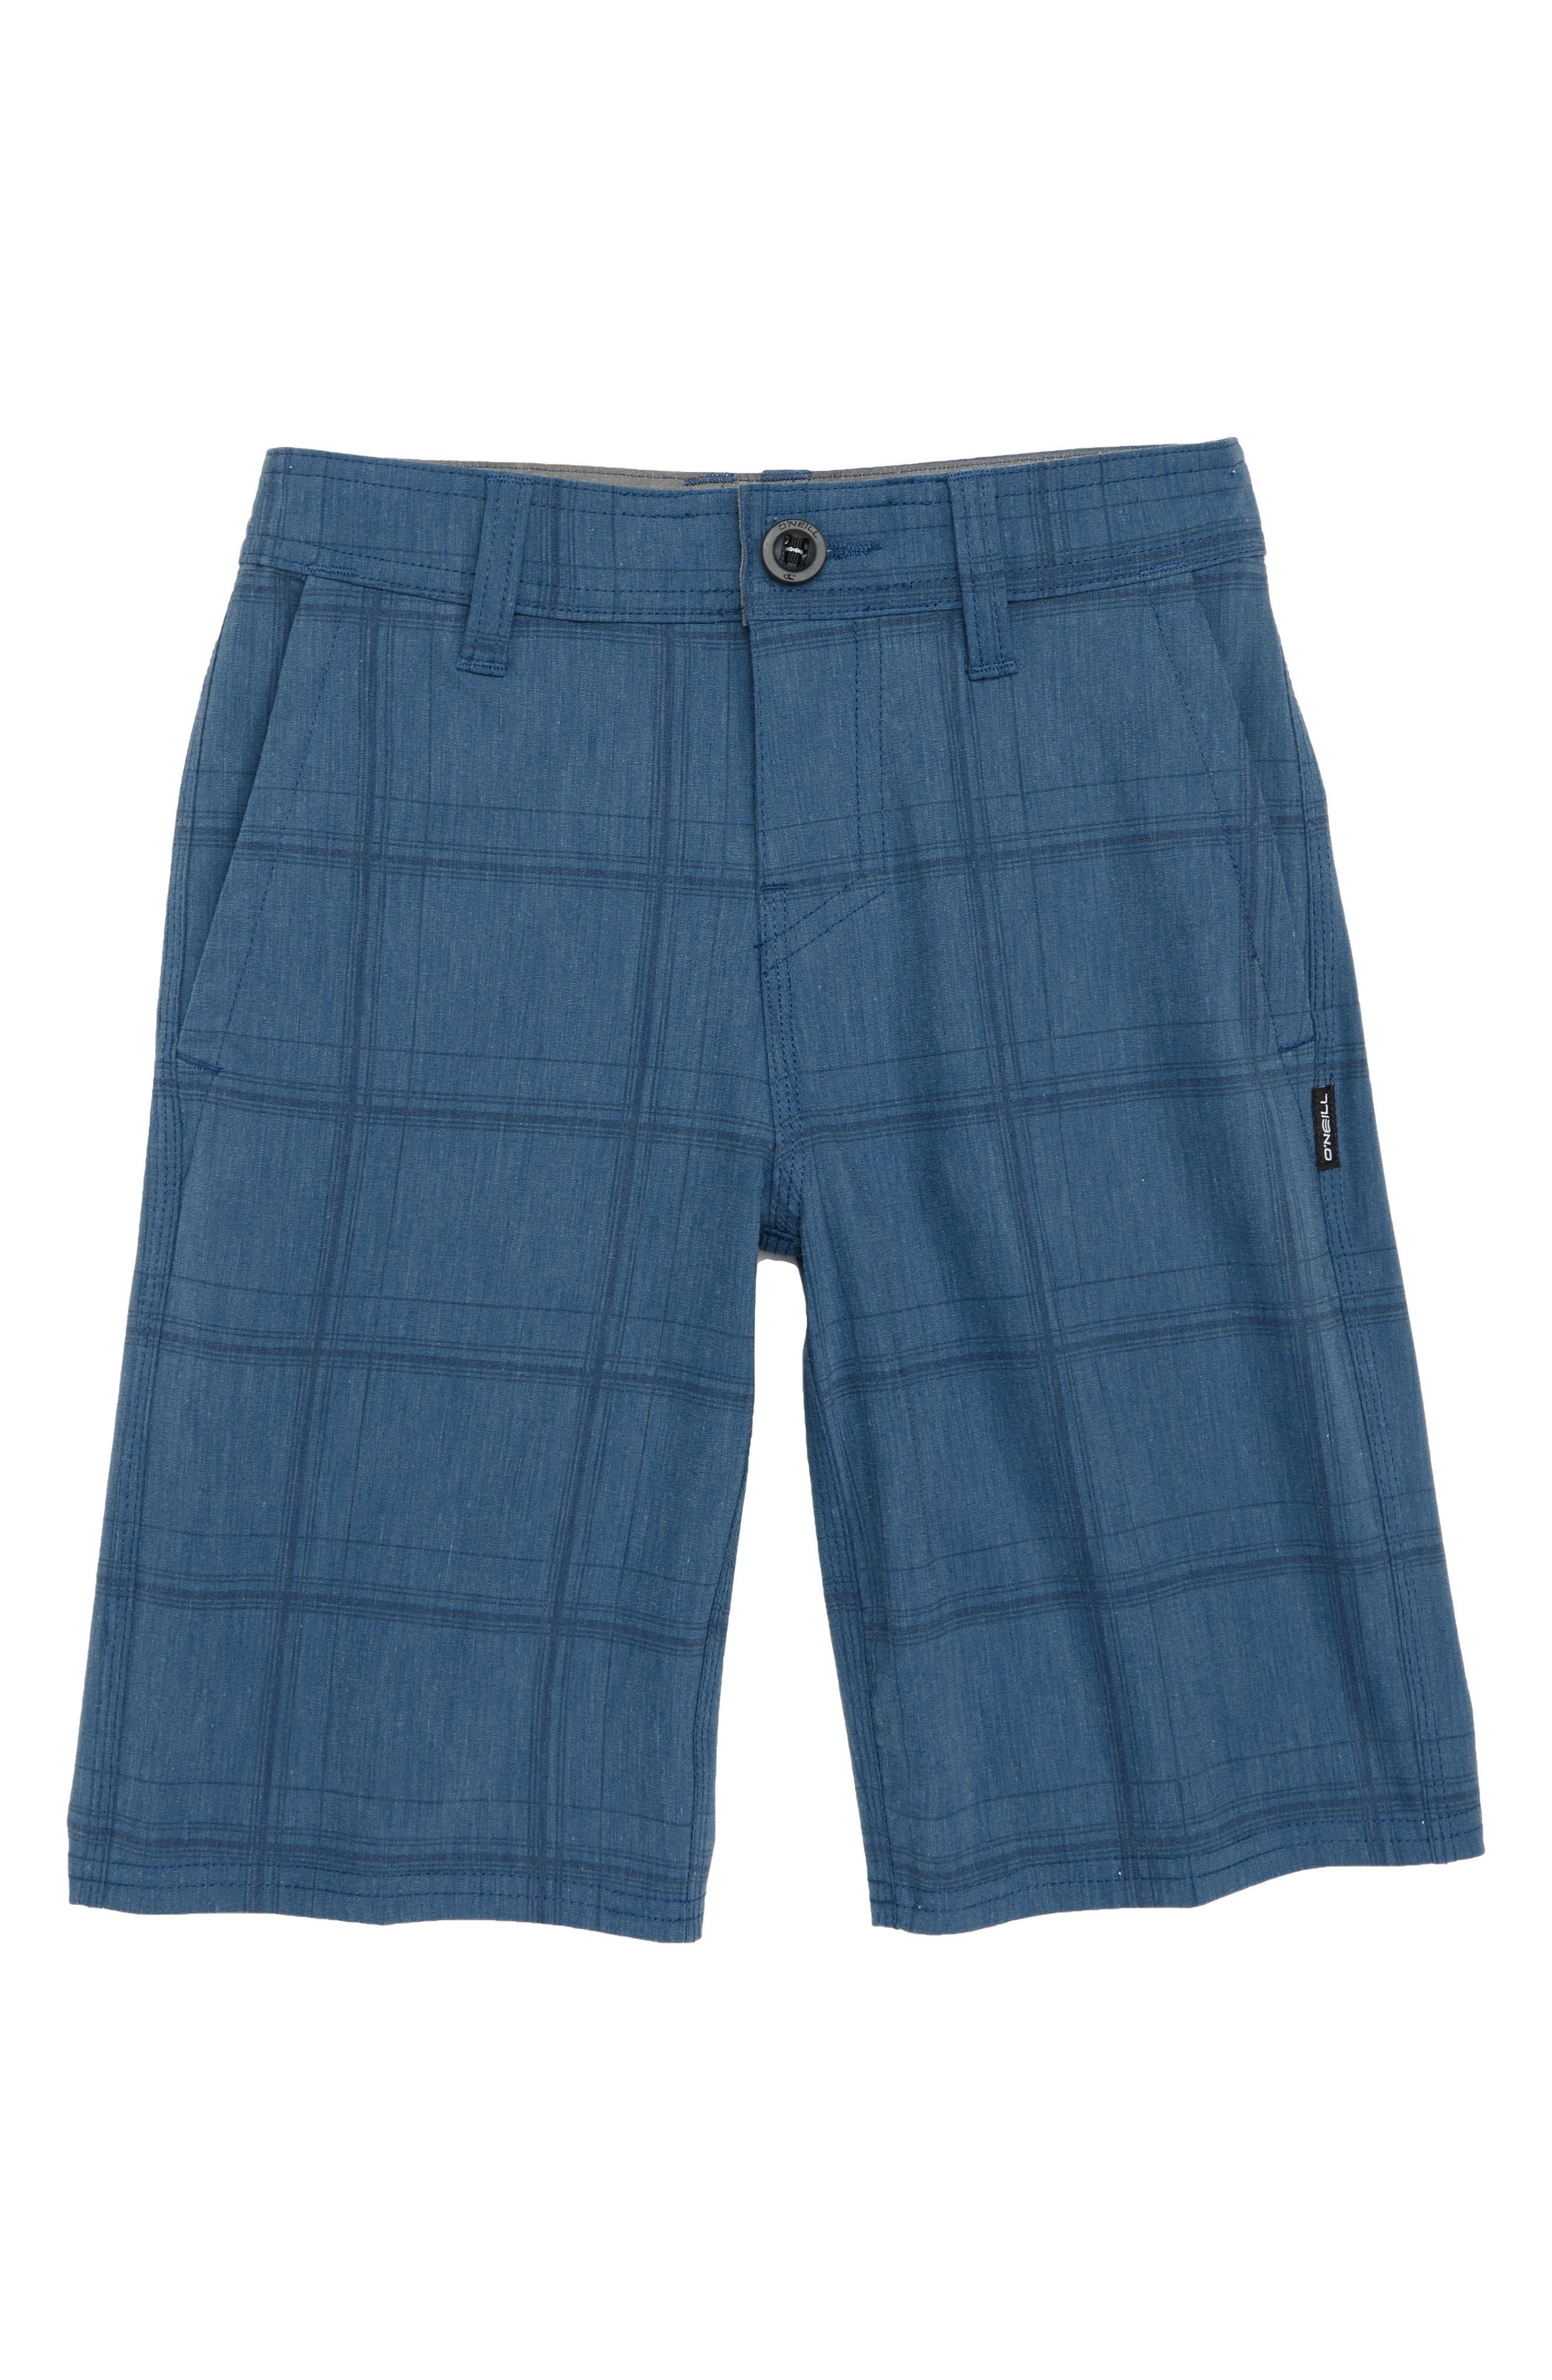 Mixed Hybrid Shorts,                         Main,                         color, Dark Blue